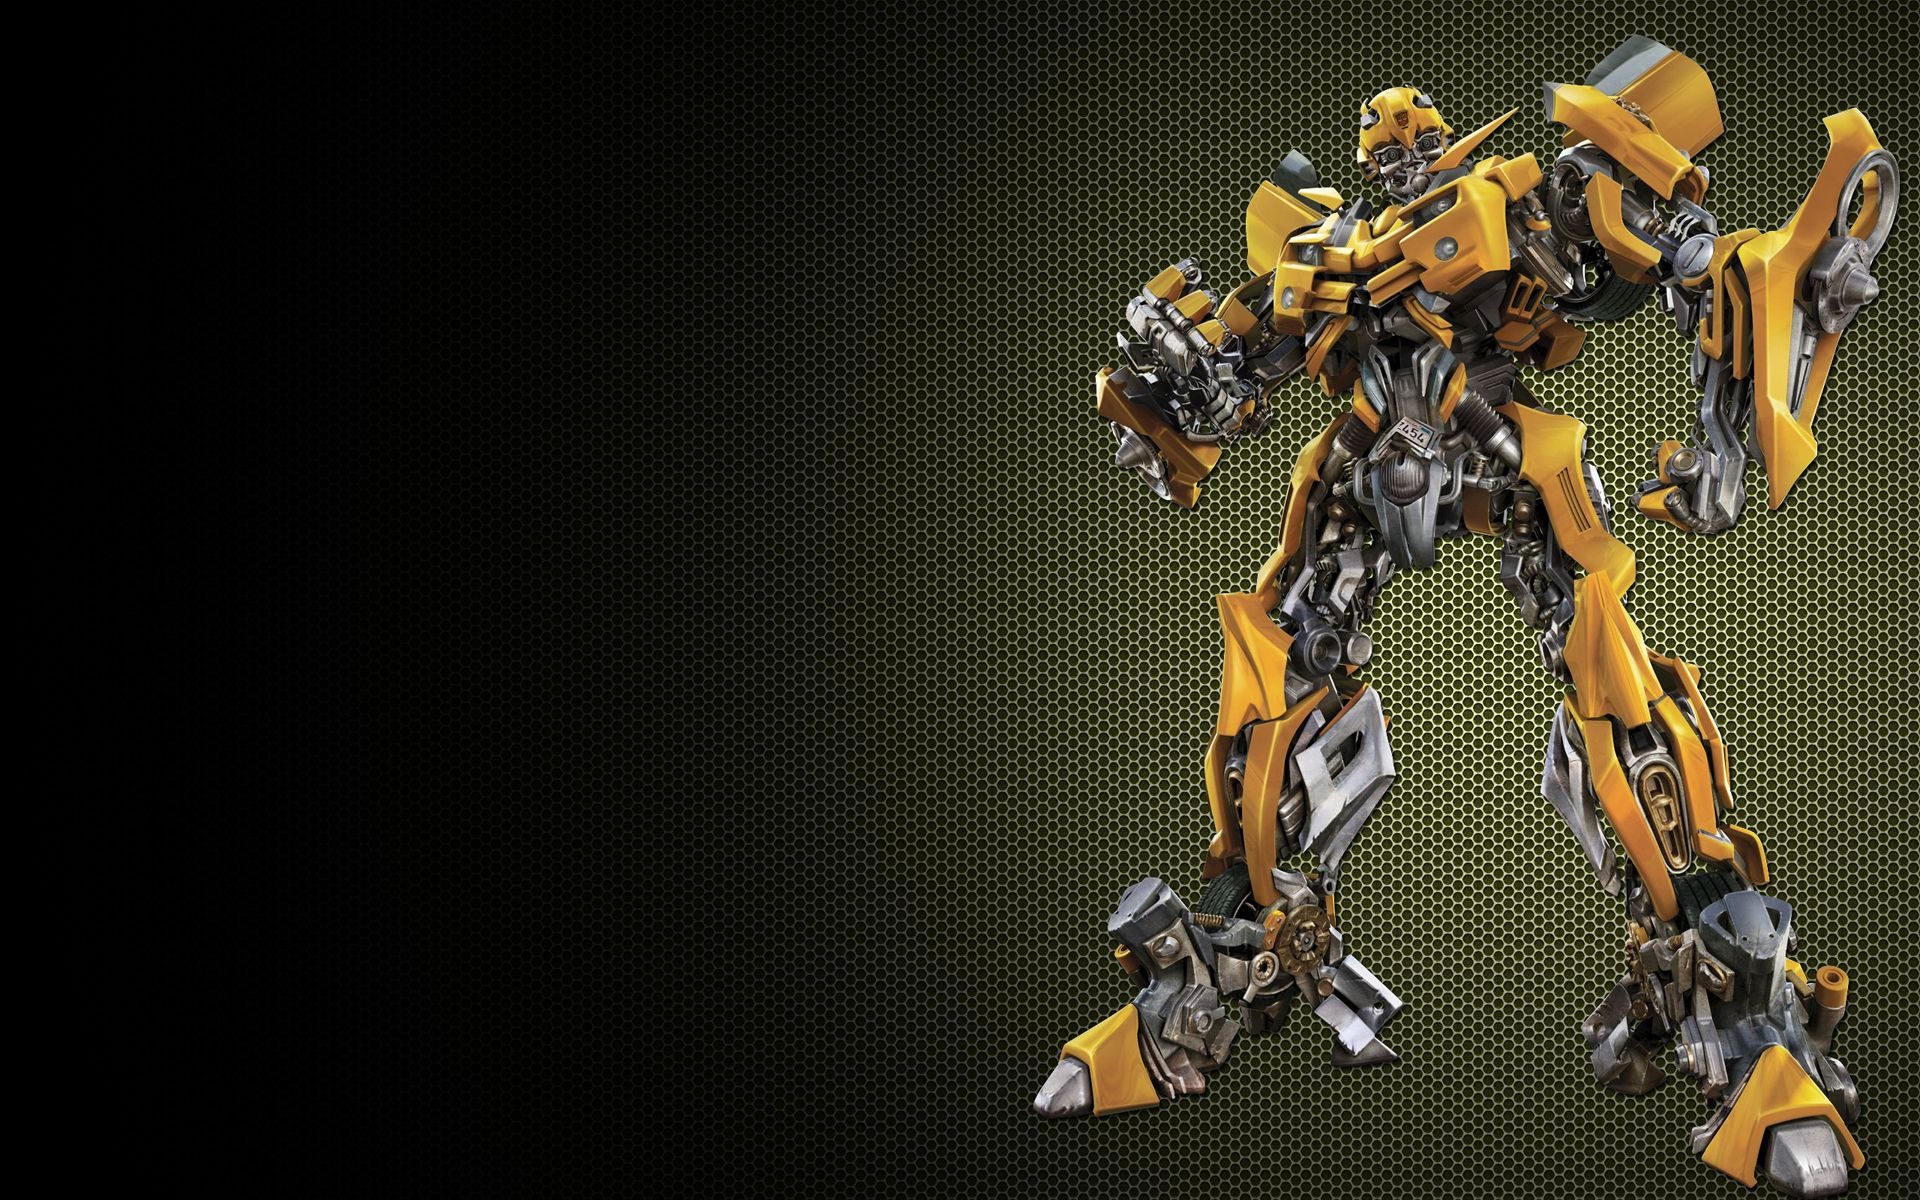 Transformer Bumblebee Wallpapers Wallpaper Transformers Bumblebee Transformers Bumble Bee